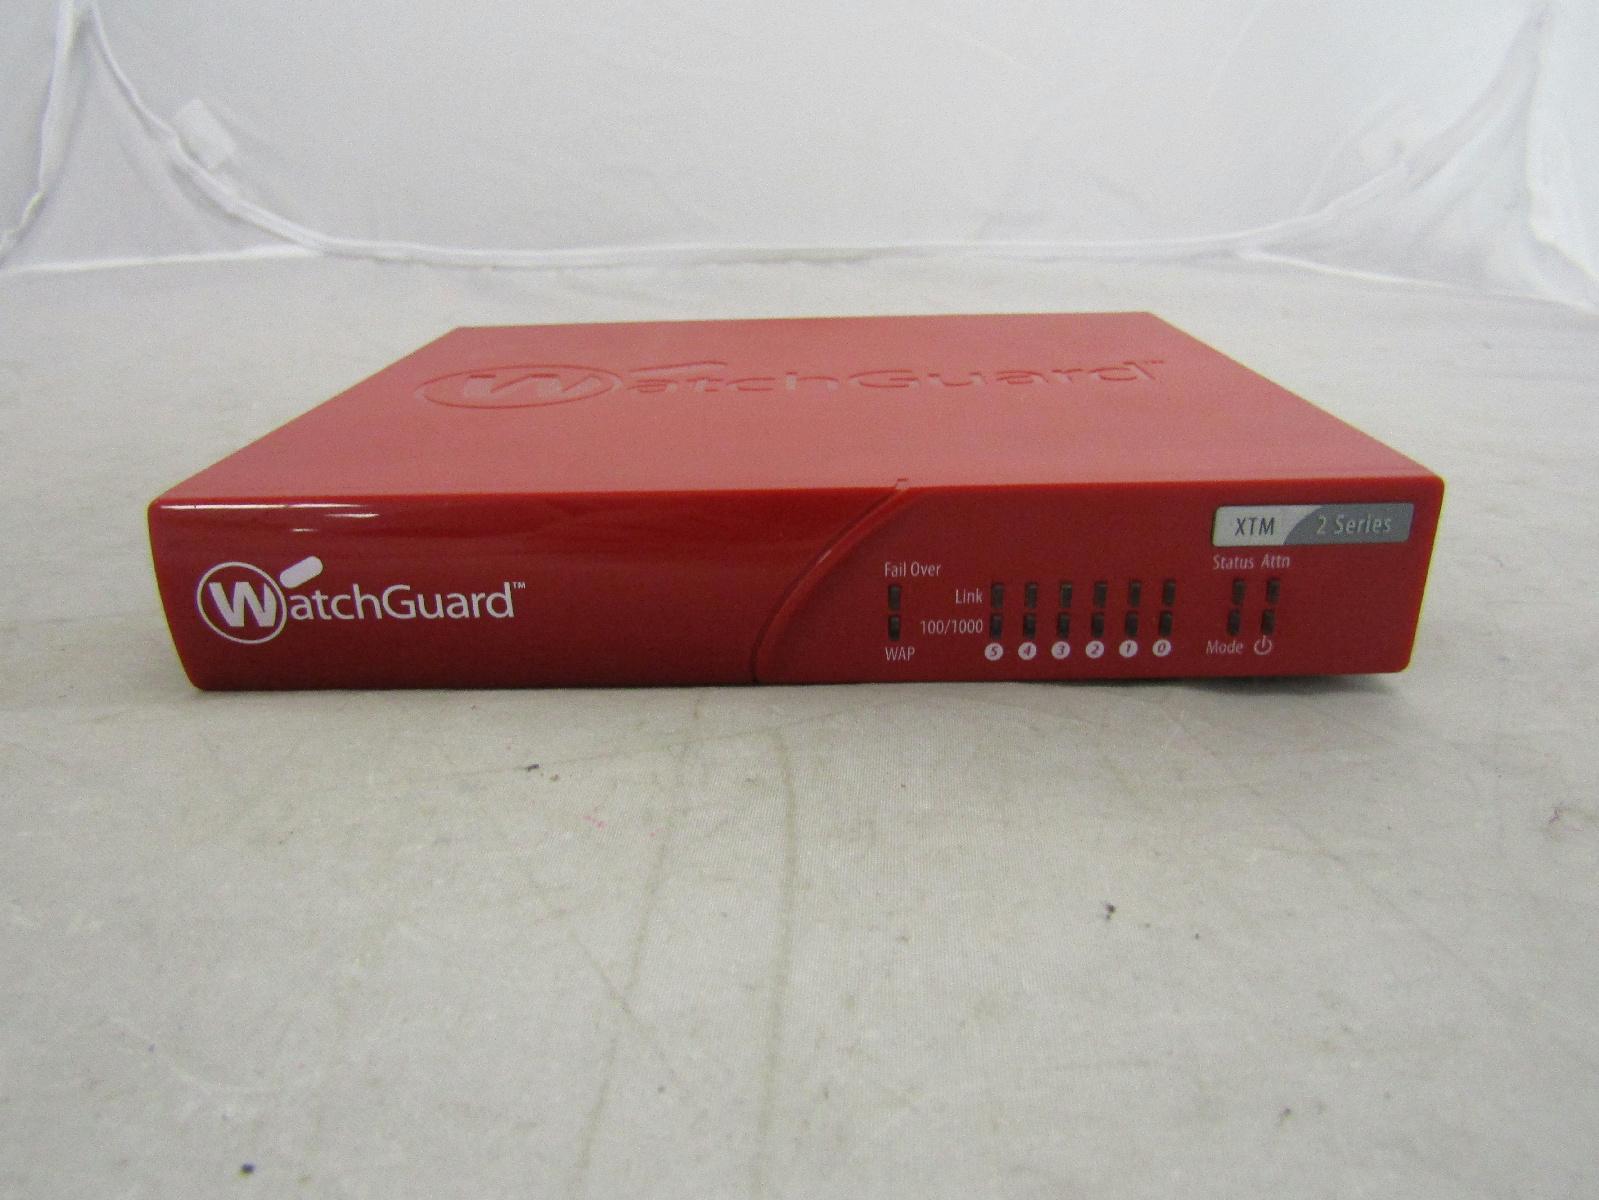 watchguard xtm 2 series manual